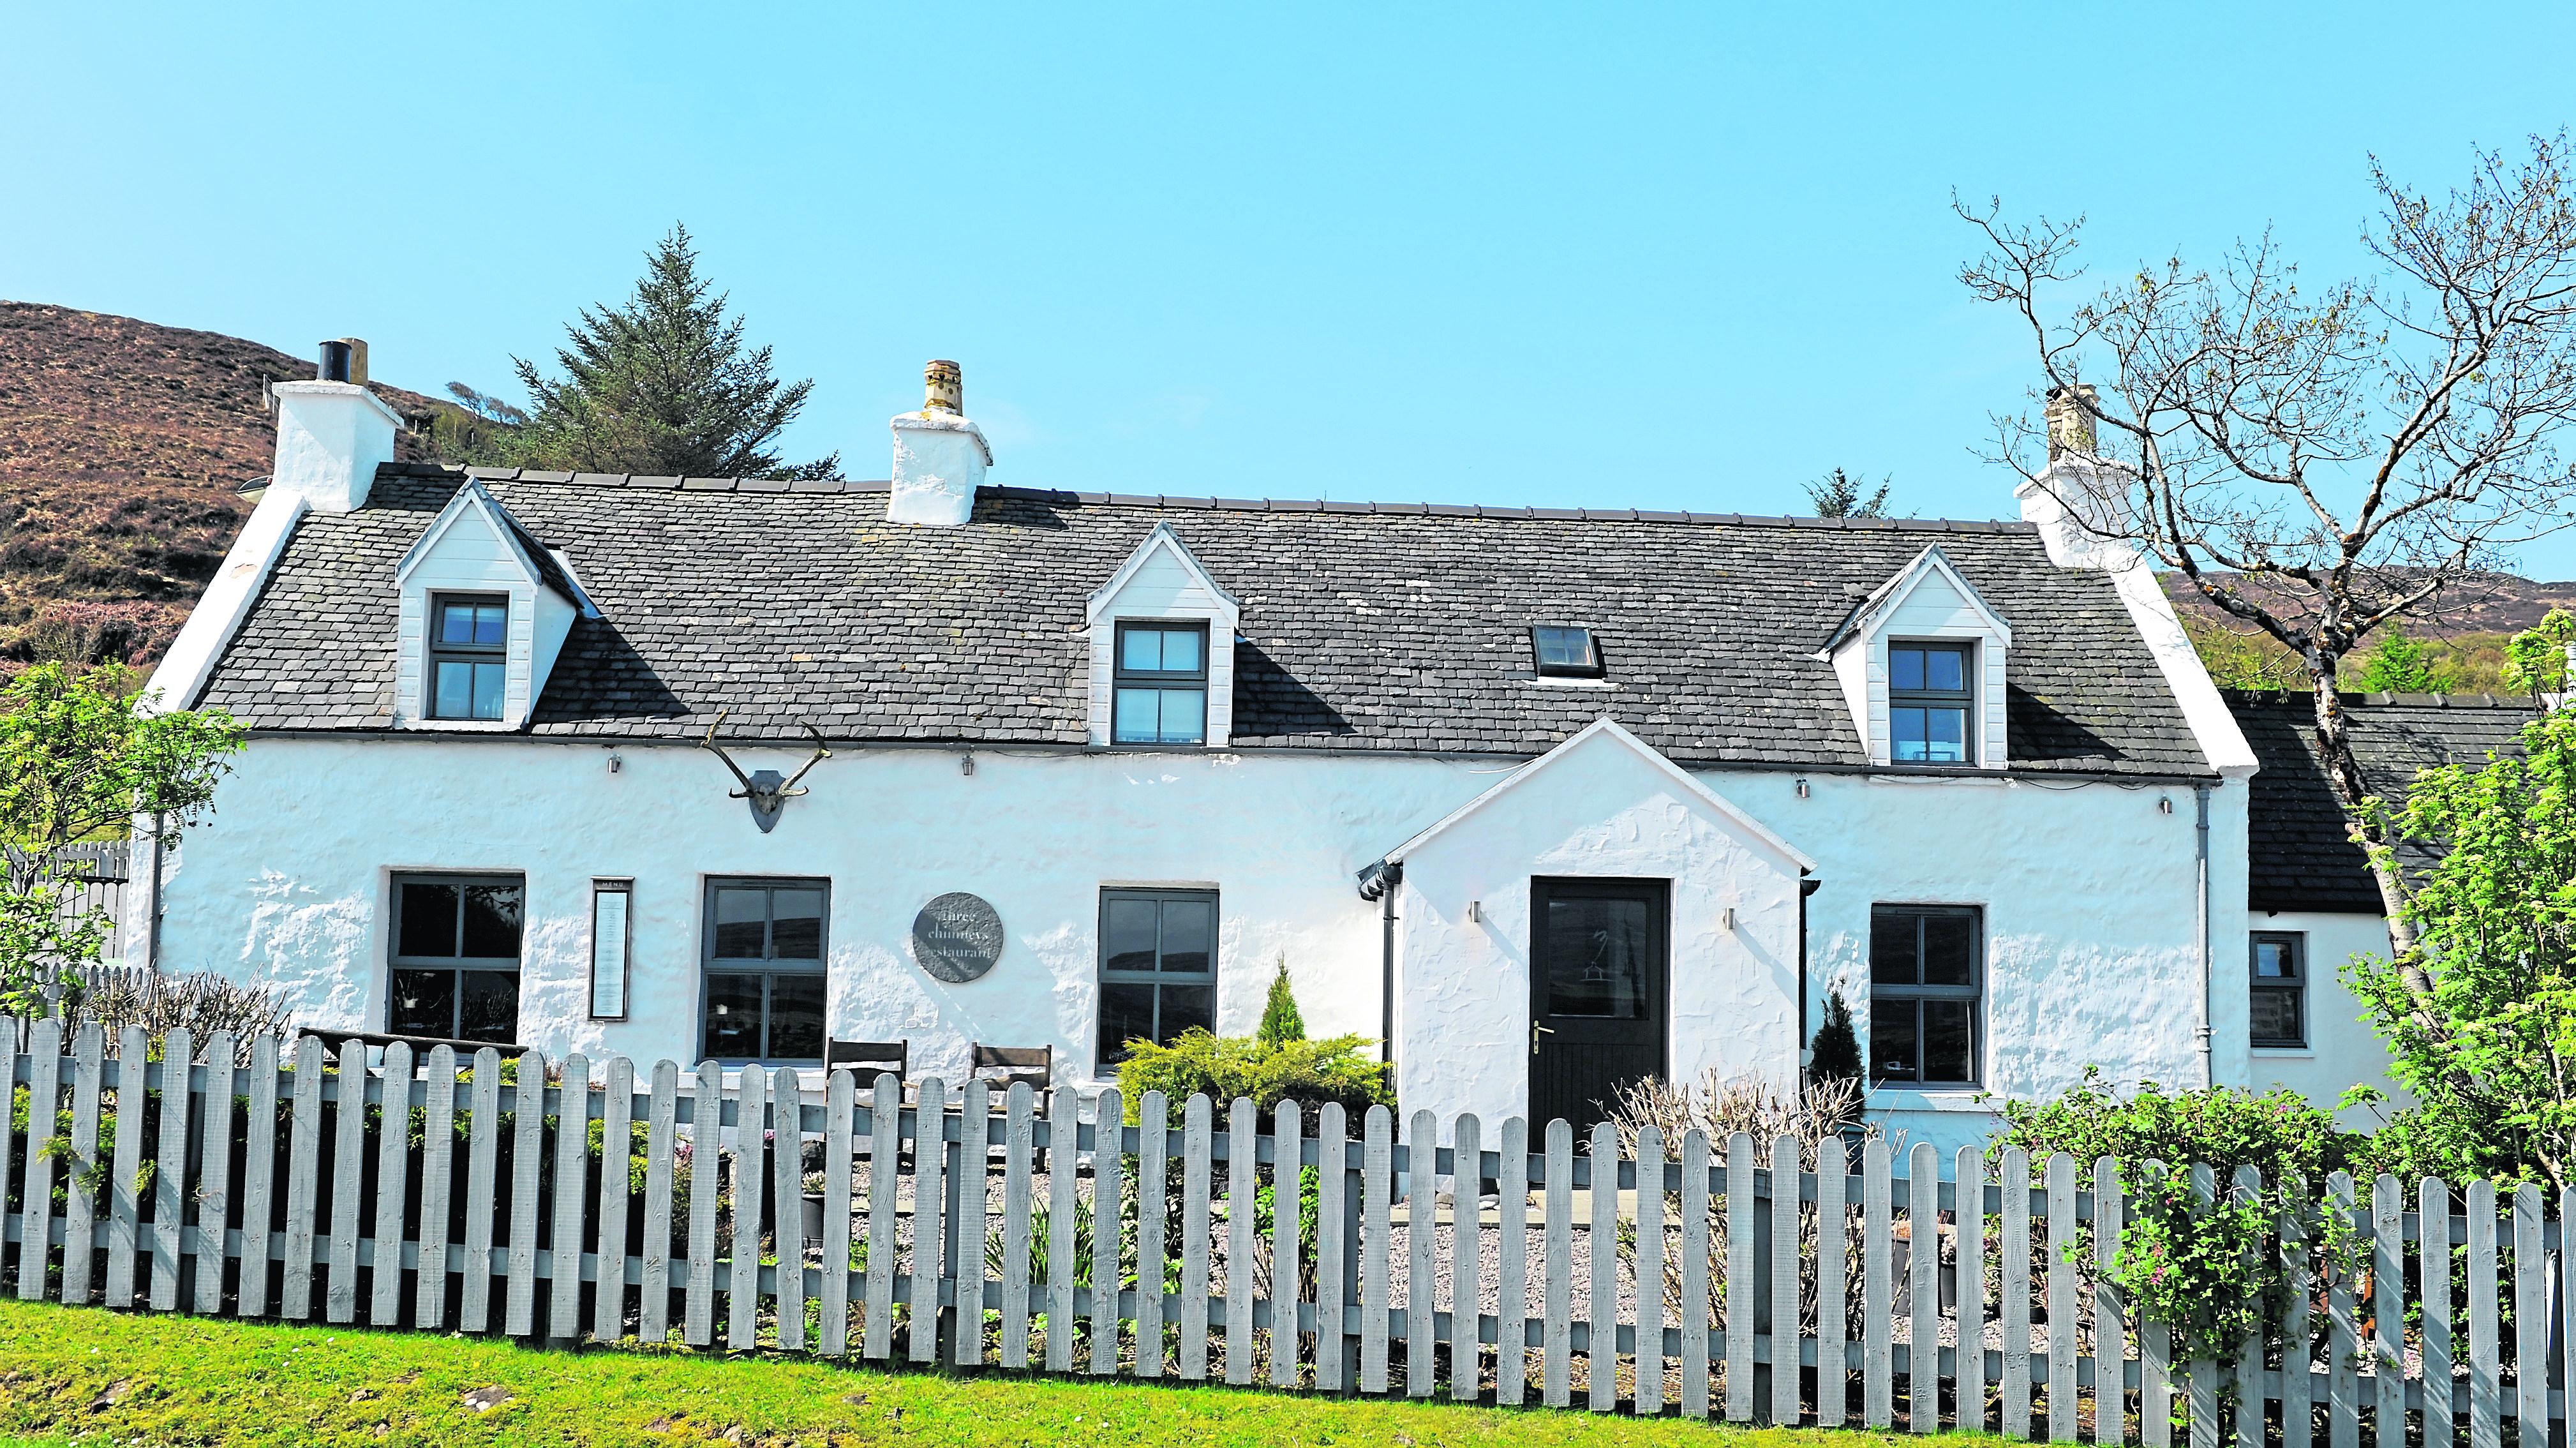 Three Chimneys Restaurant, Dunvegan.